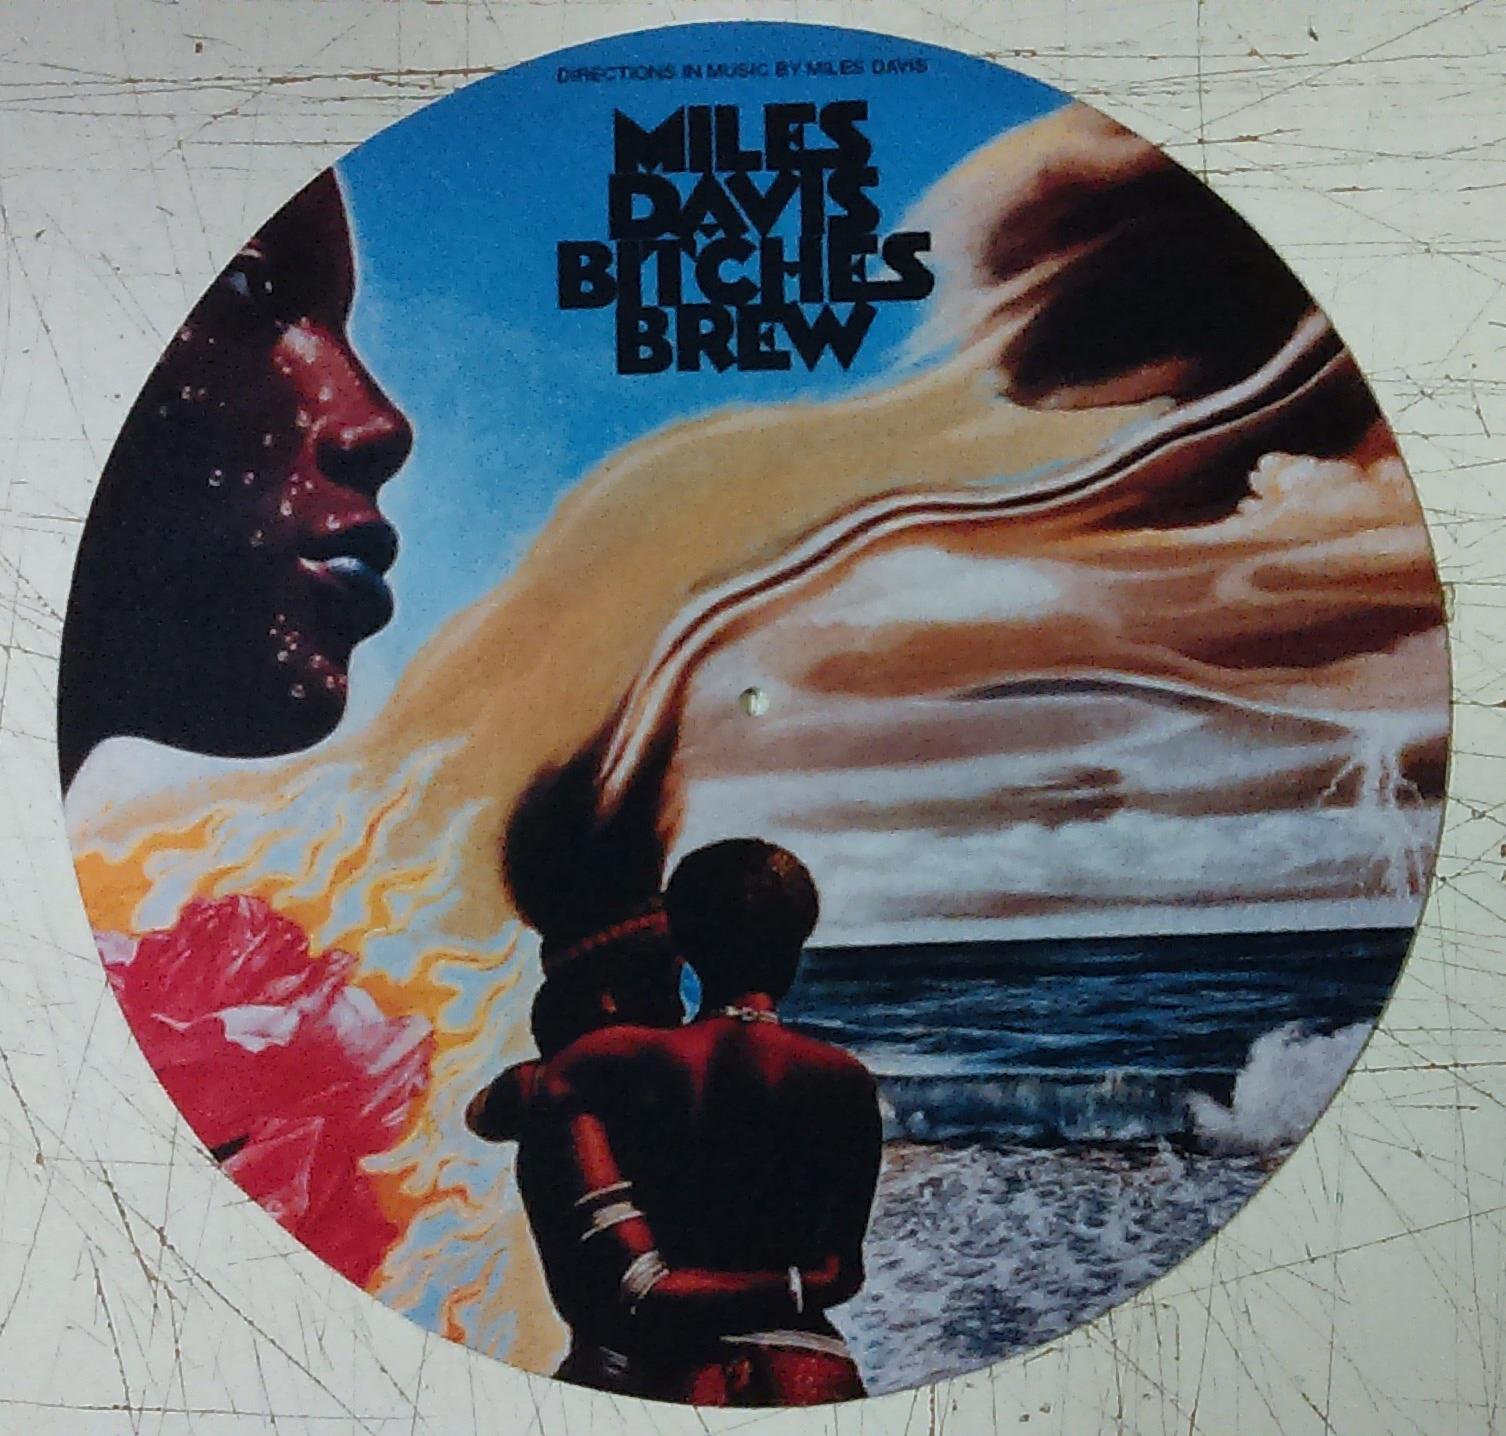 Miles Davis/BITCHES BREW SLIPMAT